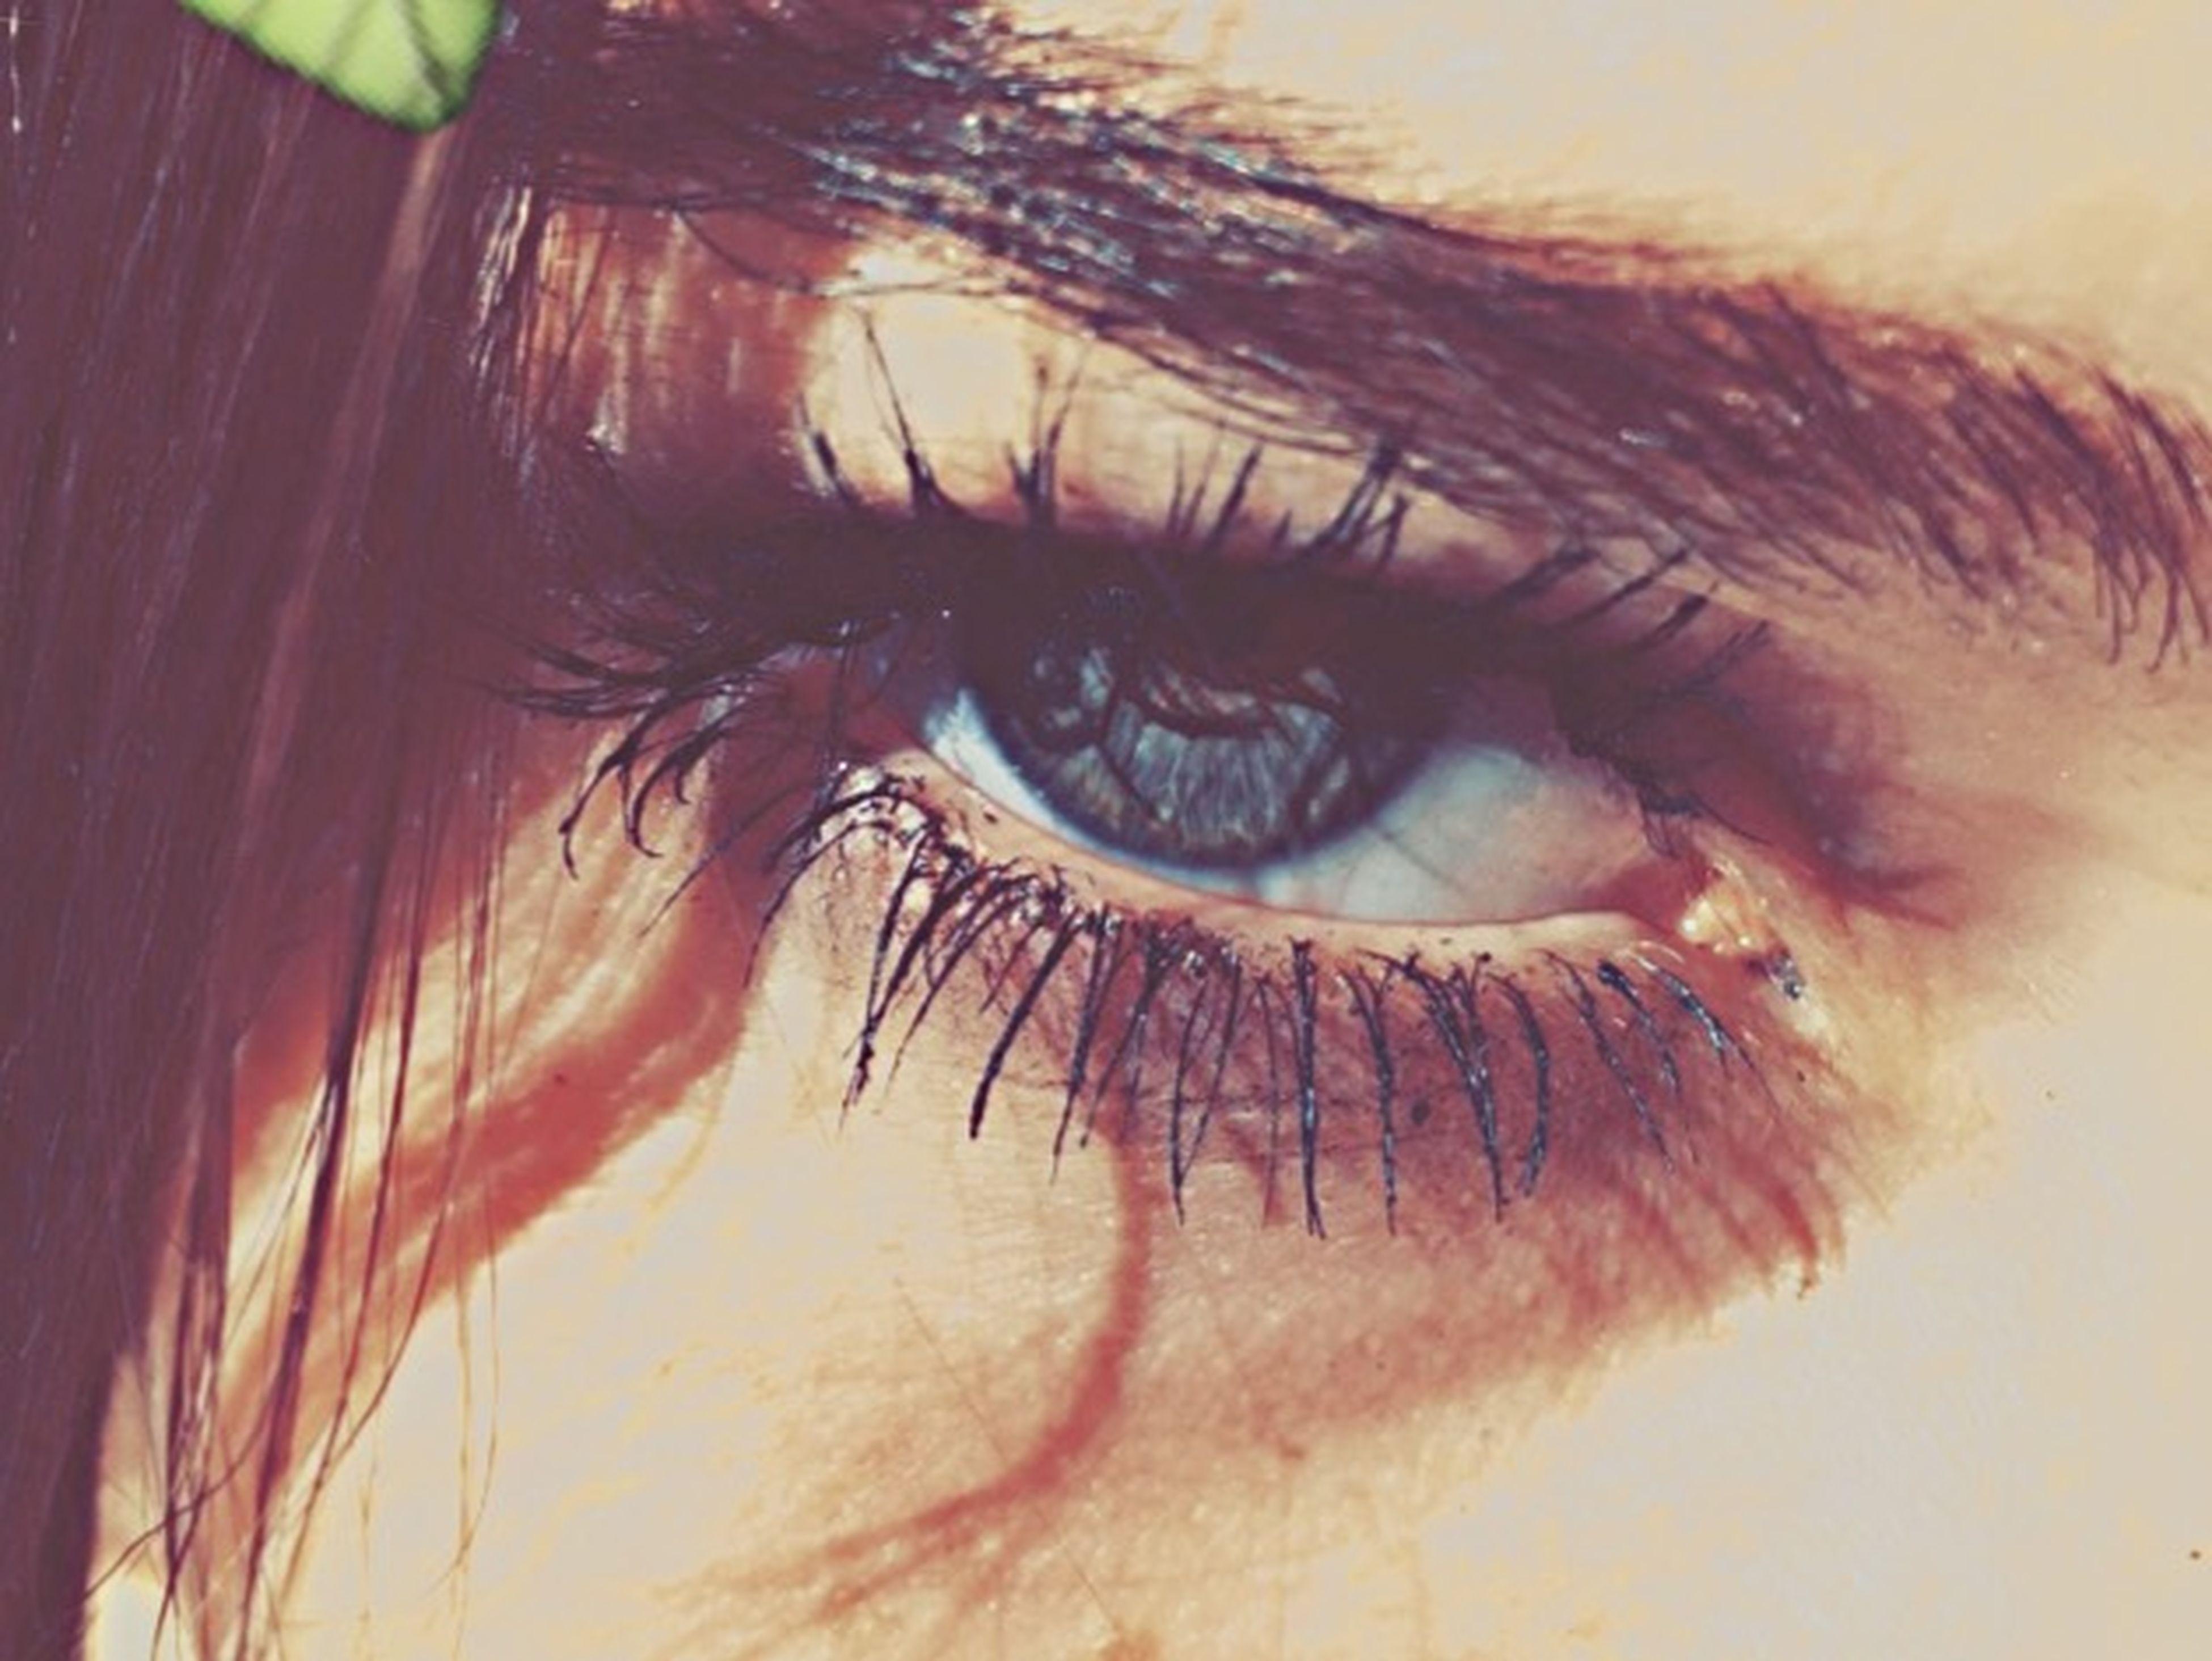 close-up, human eye, part of, eyelash, human skin, person, lifestyles, eyesight, human face, cropped, sensory perception, unrecognizable person, headshot, leisure activity, eyeball, extreme close-up